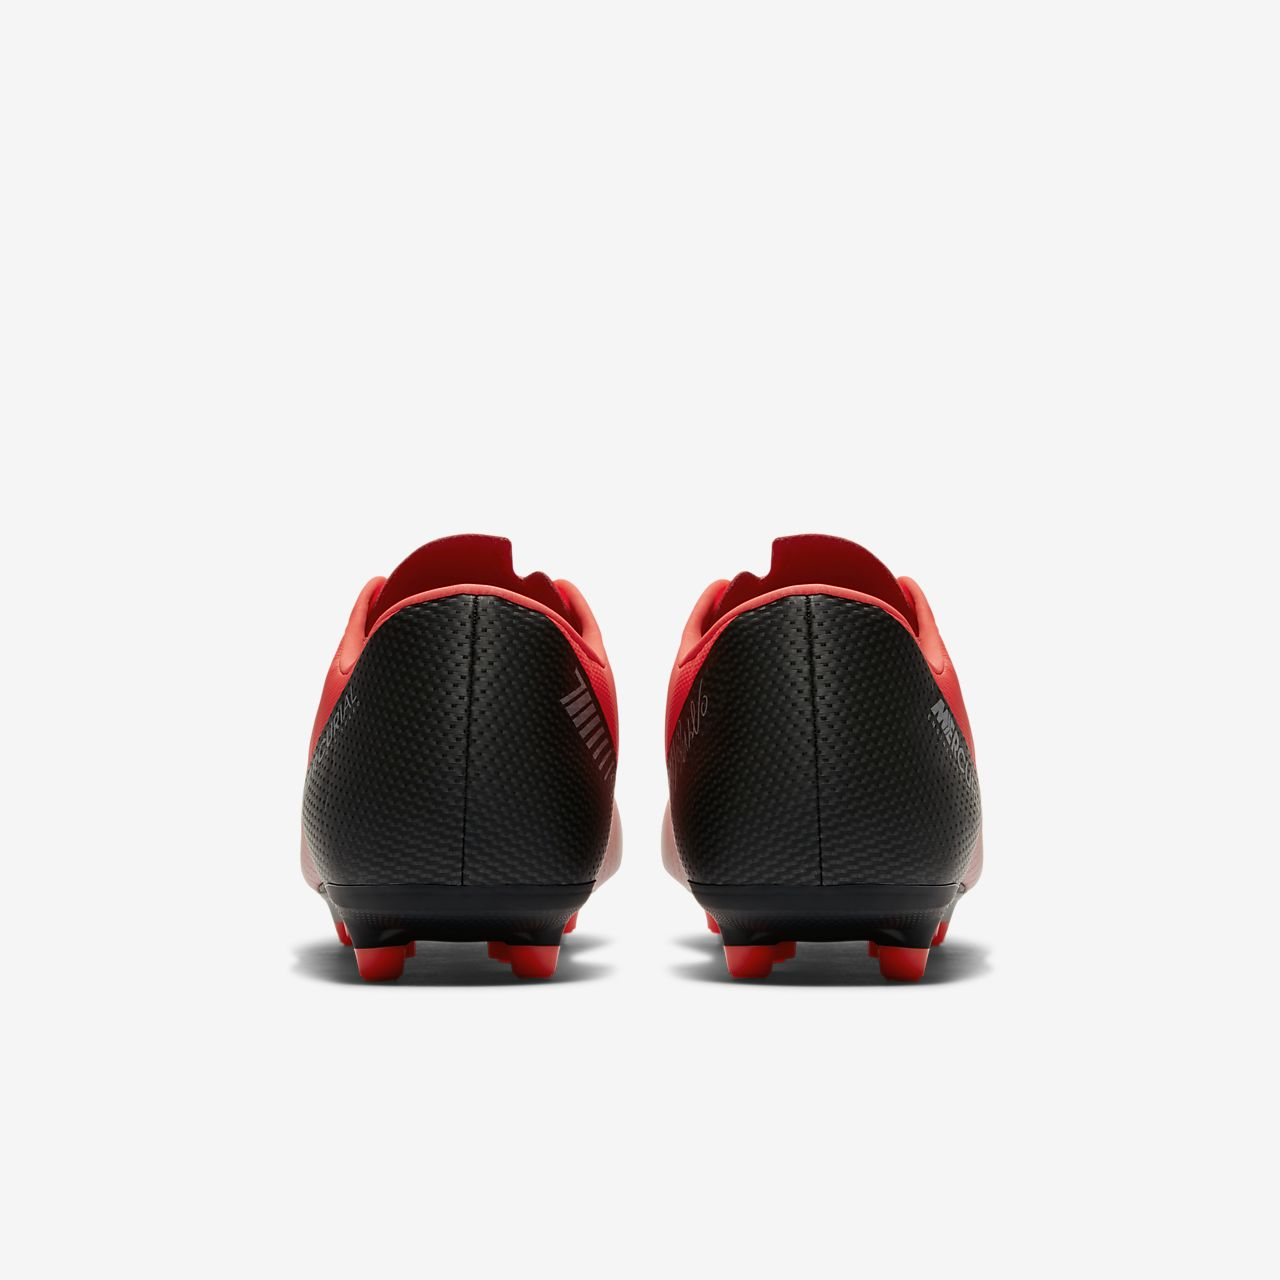 Nike Zapatos Yoga Nike Zapatos Yoga pgxUqwP 0693c124649d2